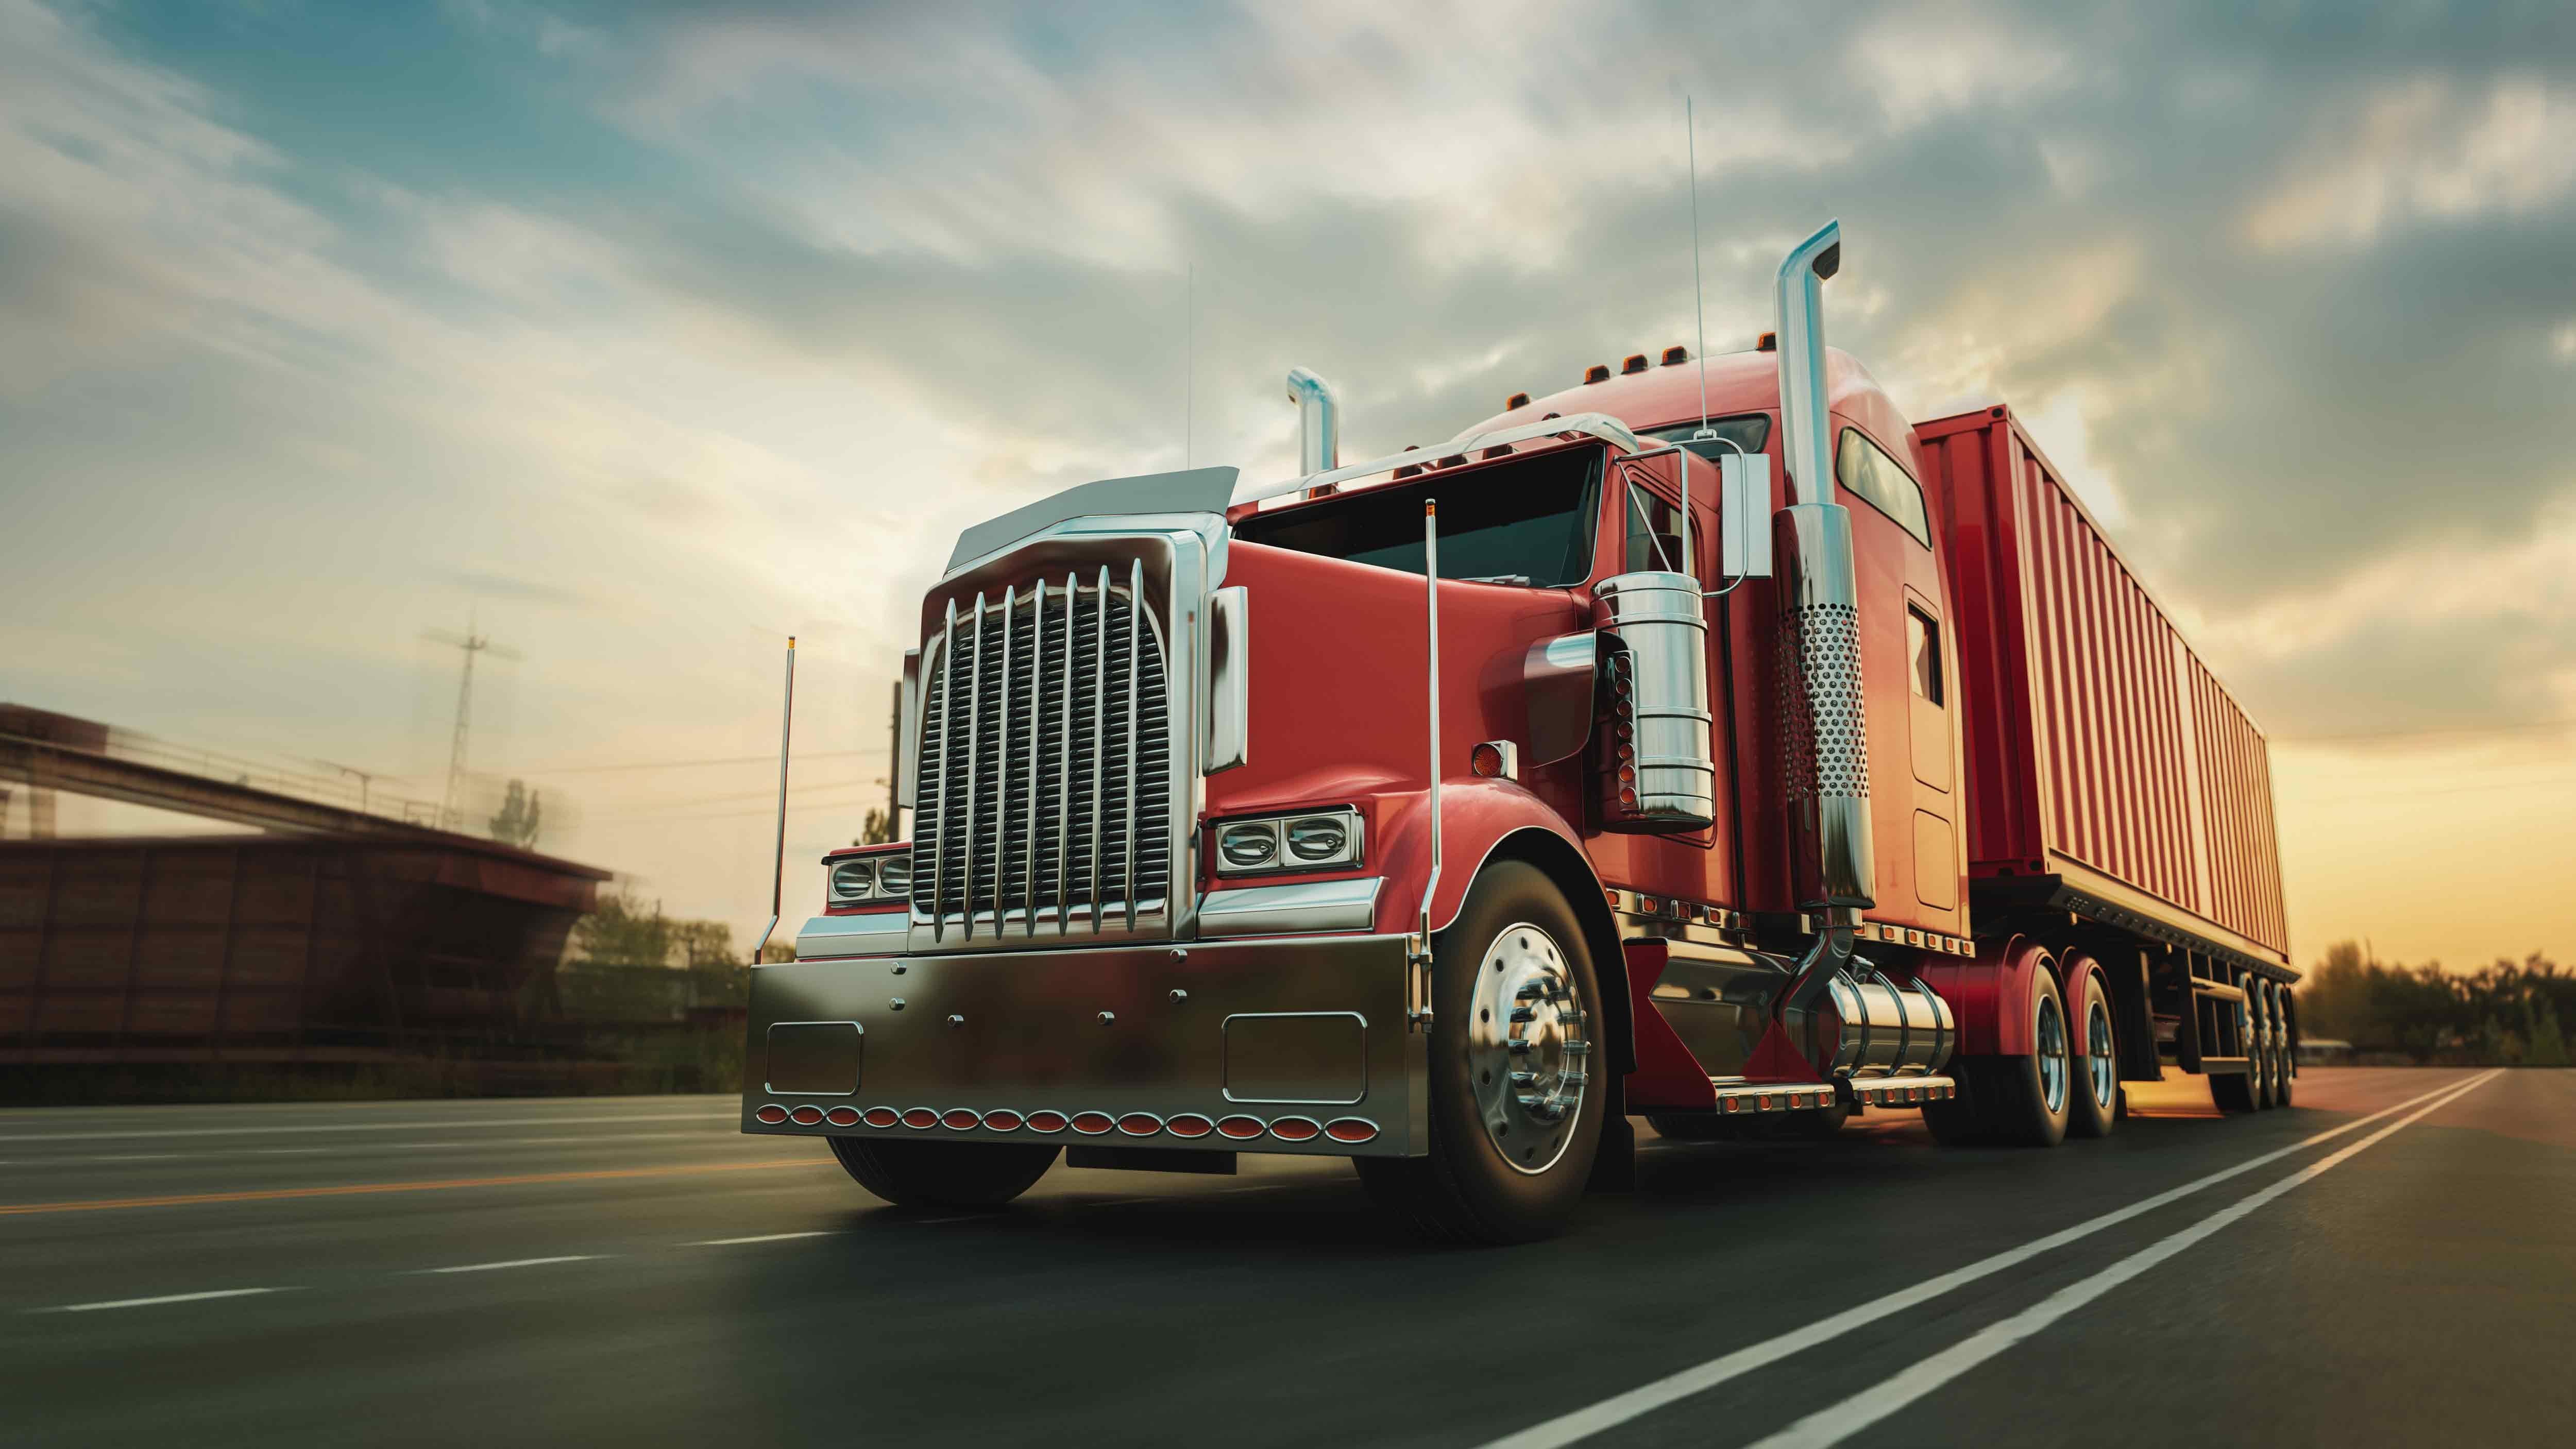 truck-runs-highway-with-speed